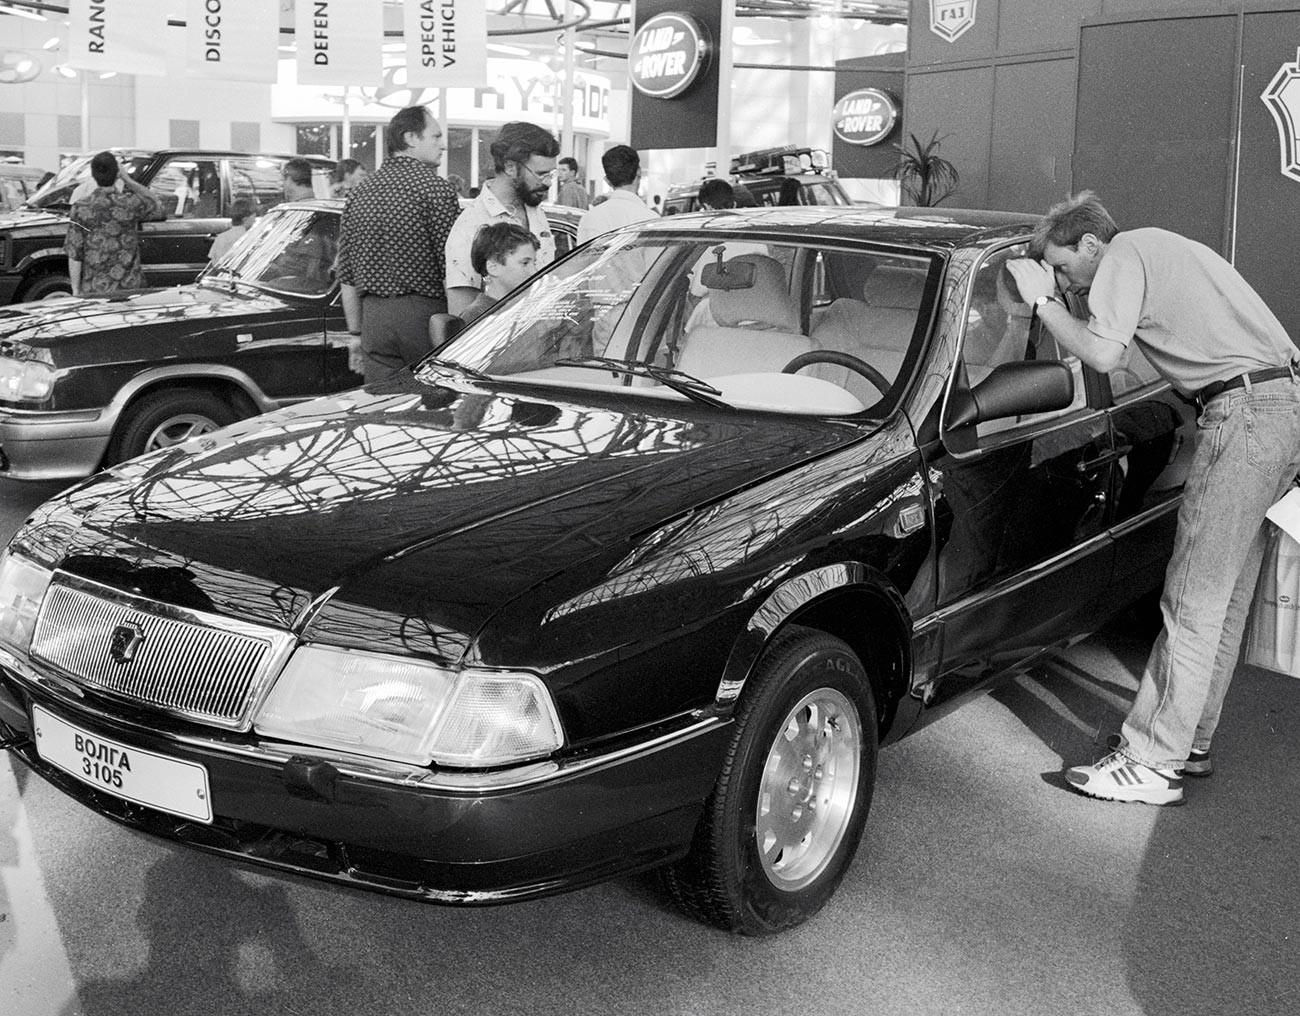 GAZ-3105 na mednarodnem avtomobilskem sejmu leta 1995